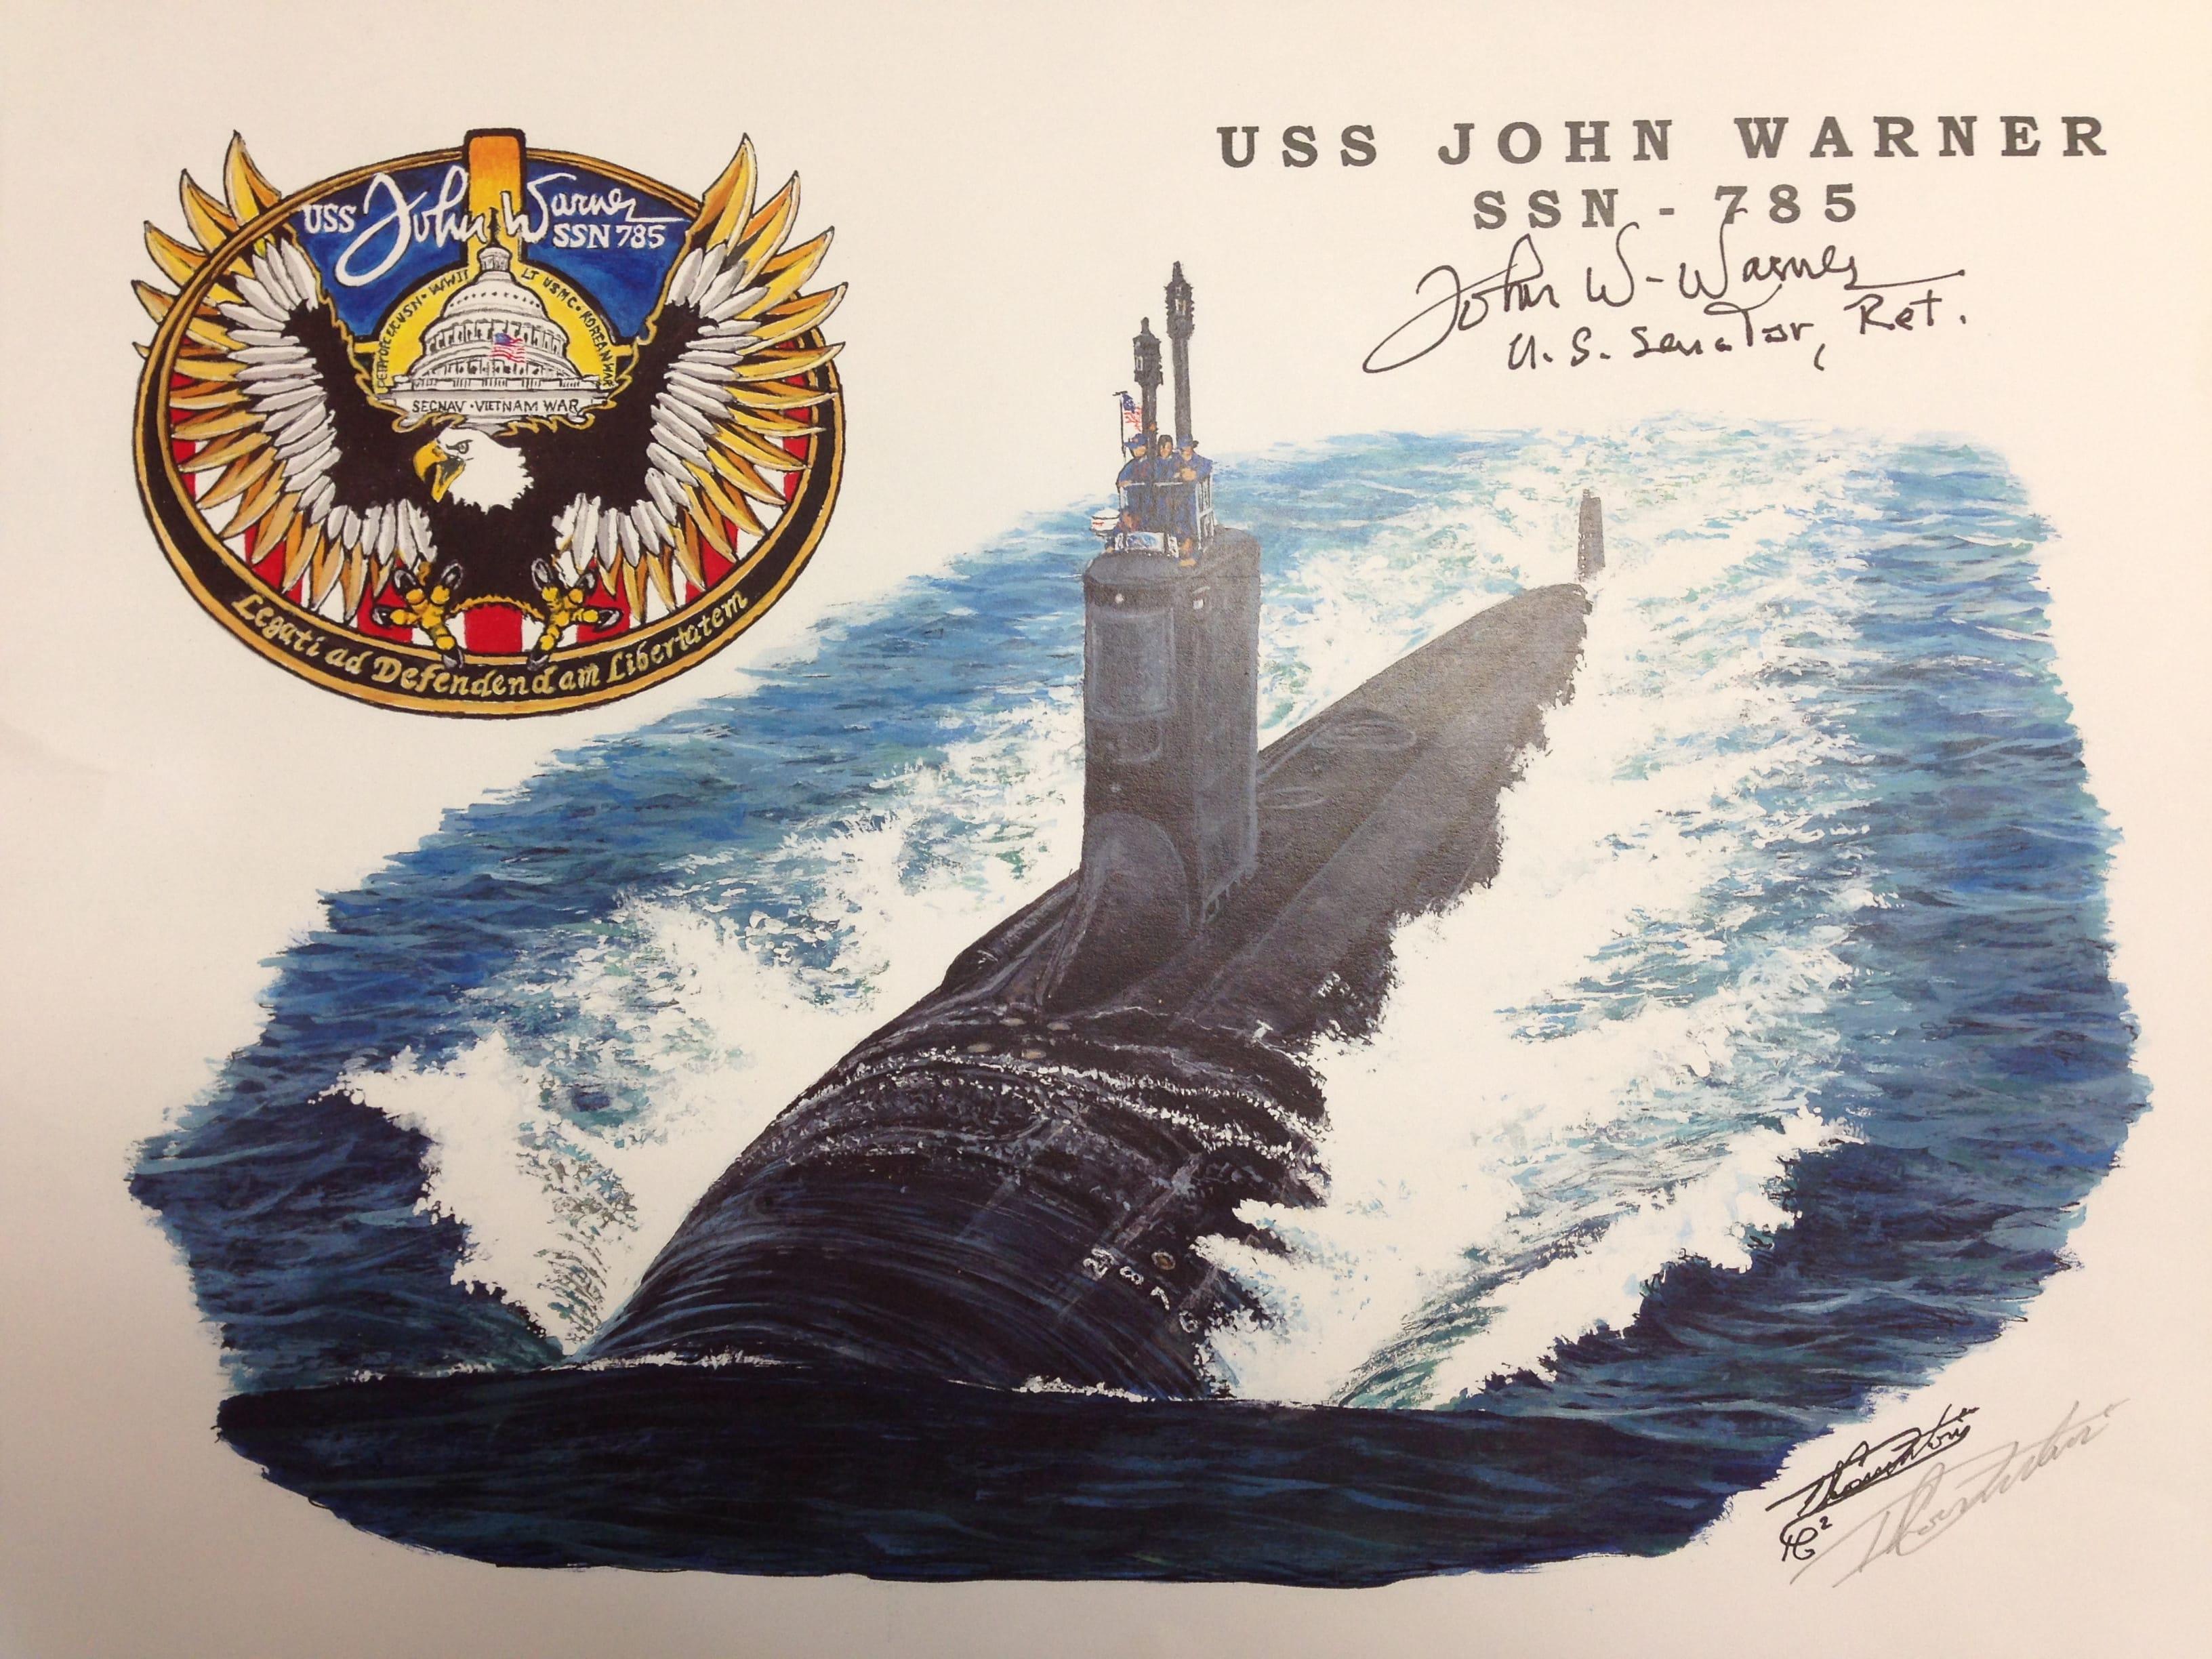 USS John Warner